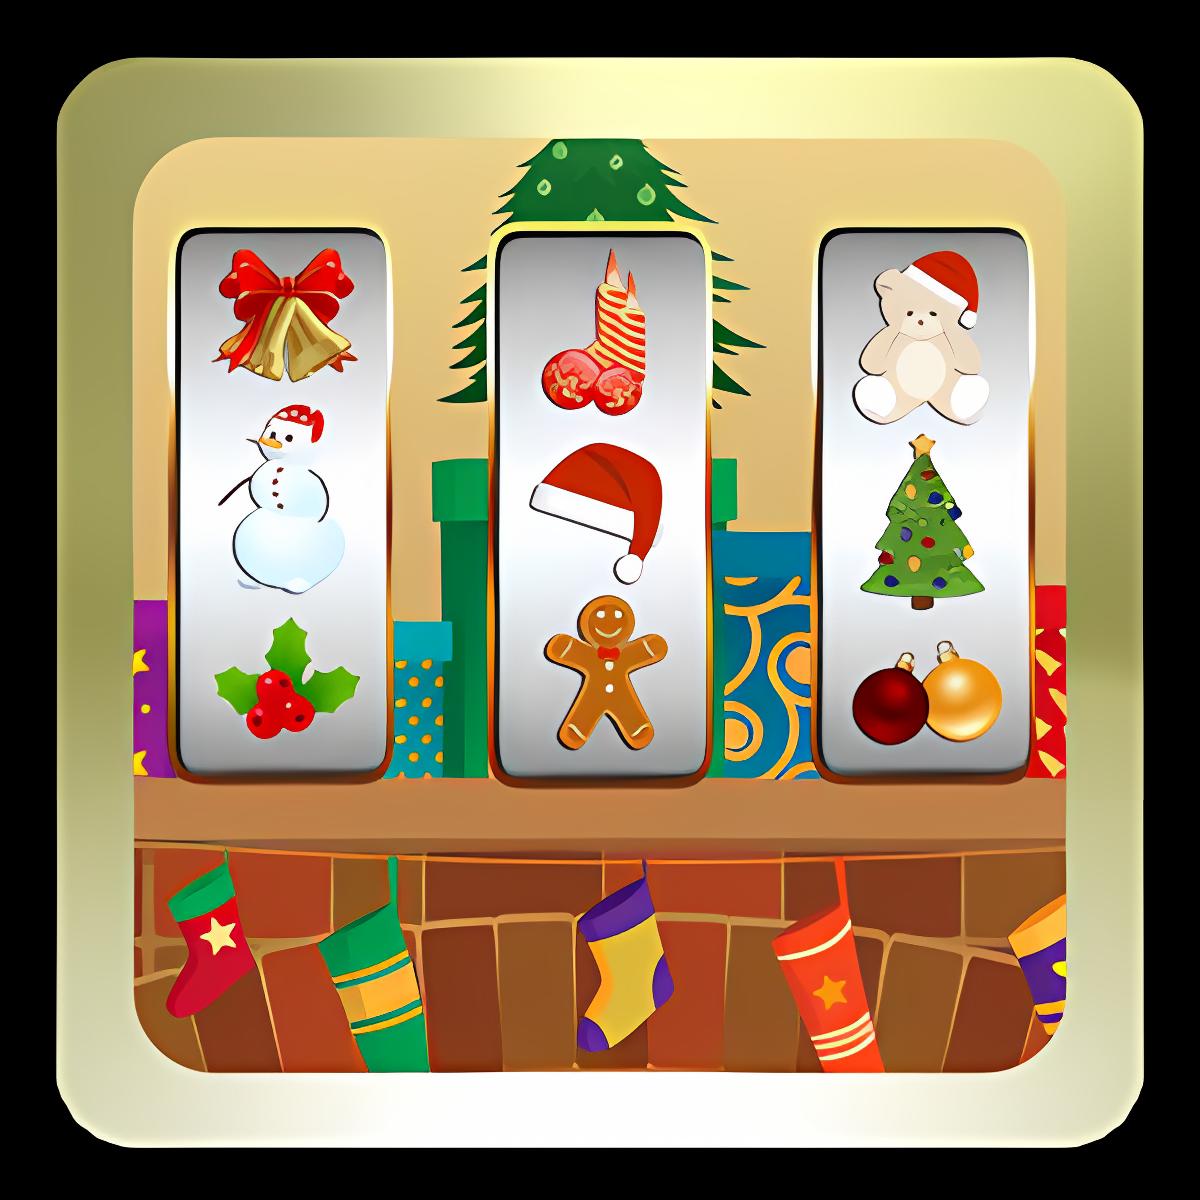 Máquina Tragaperras de Navidad